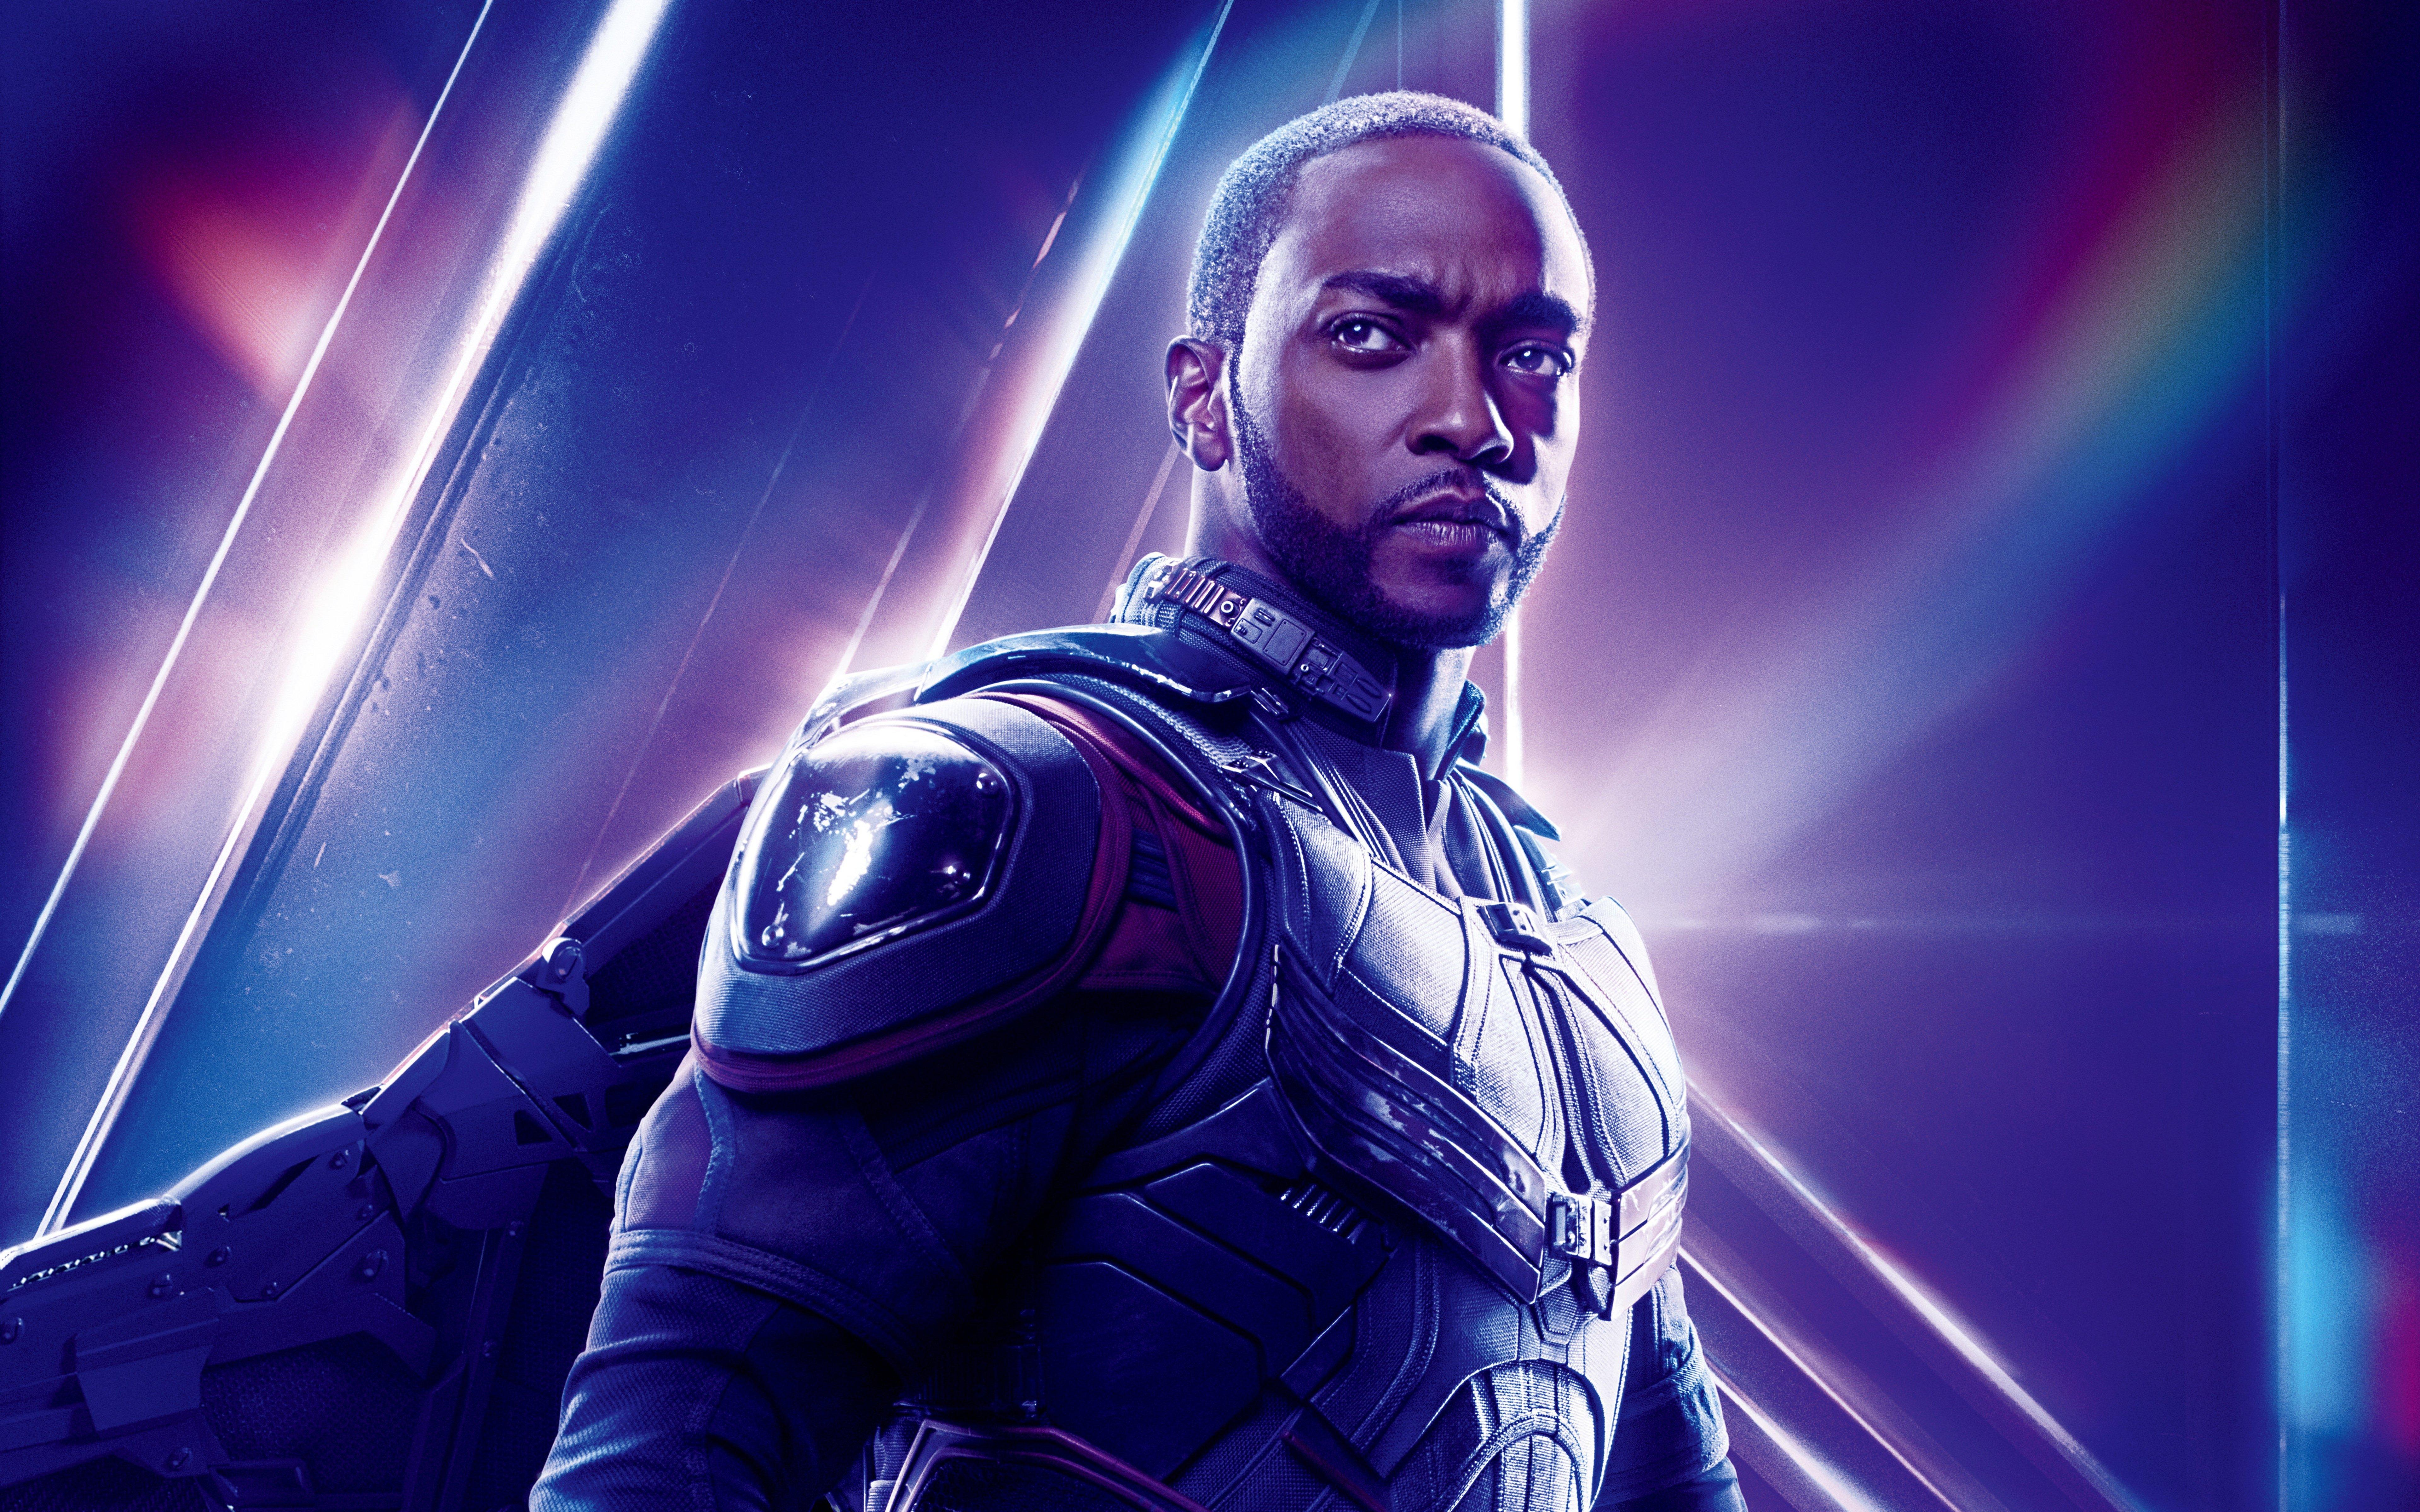 Avengers Infinity War 2018 Thanos 4k Uhd 3 2 3840x2560: Avengers: Infinity War (2018) Falcon 8K Ultra HD Wallpaper